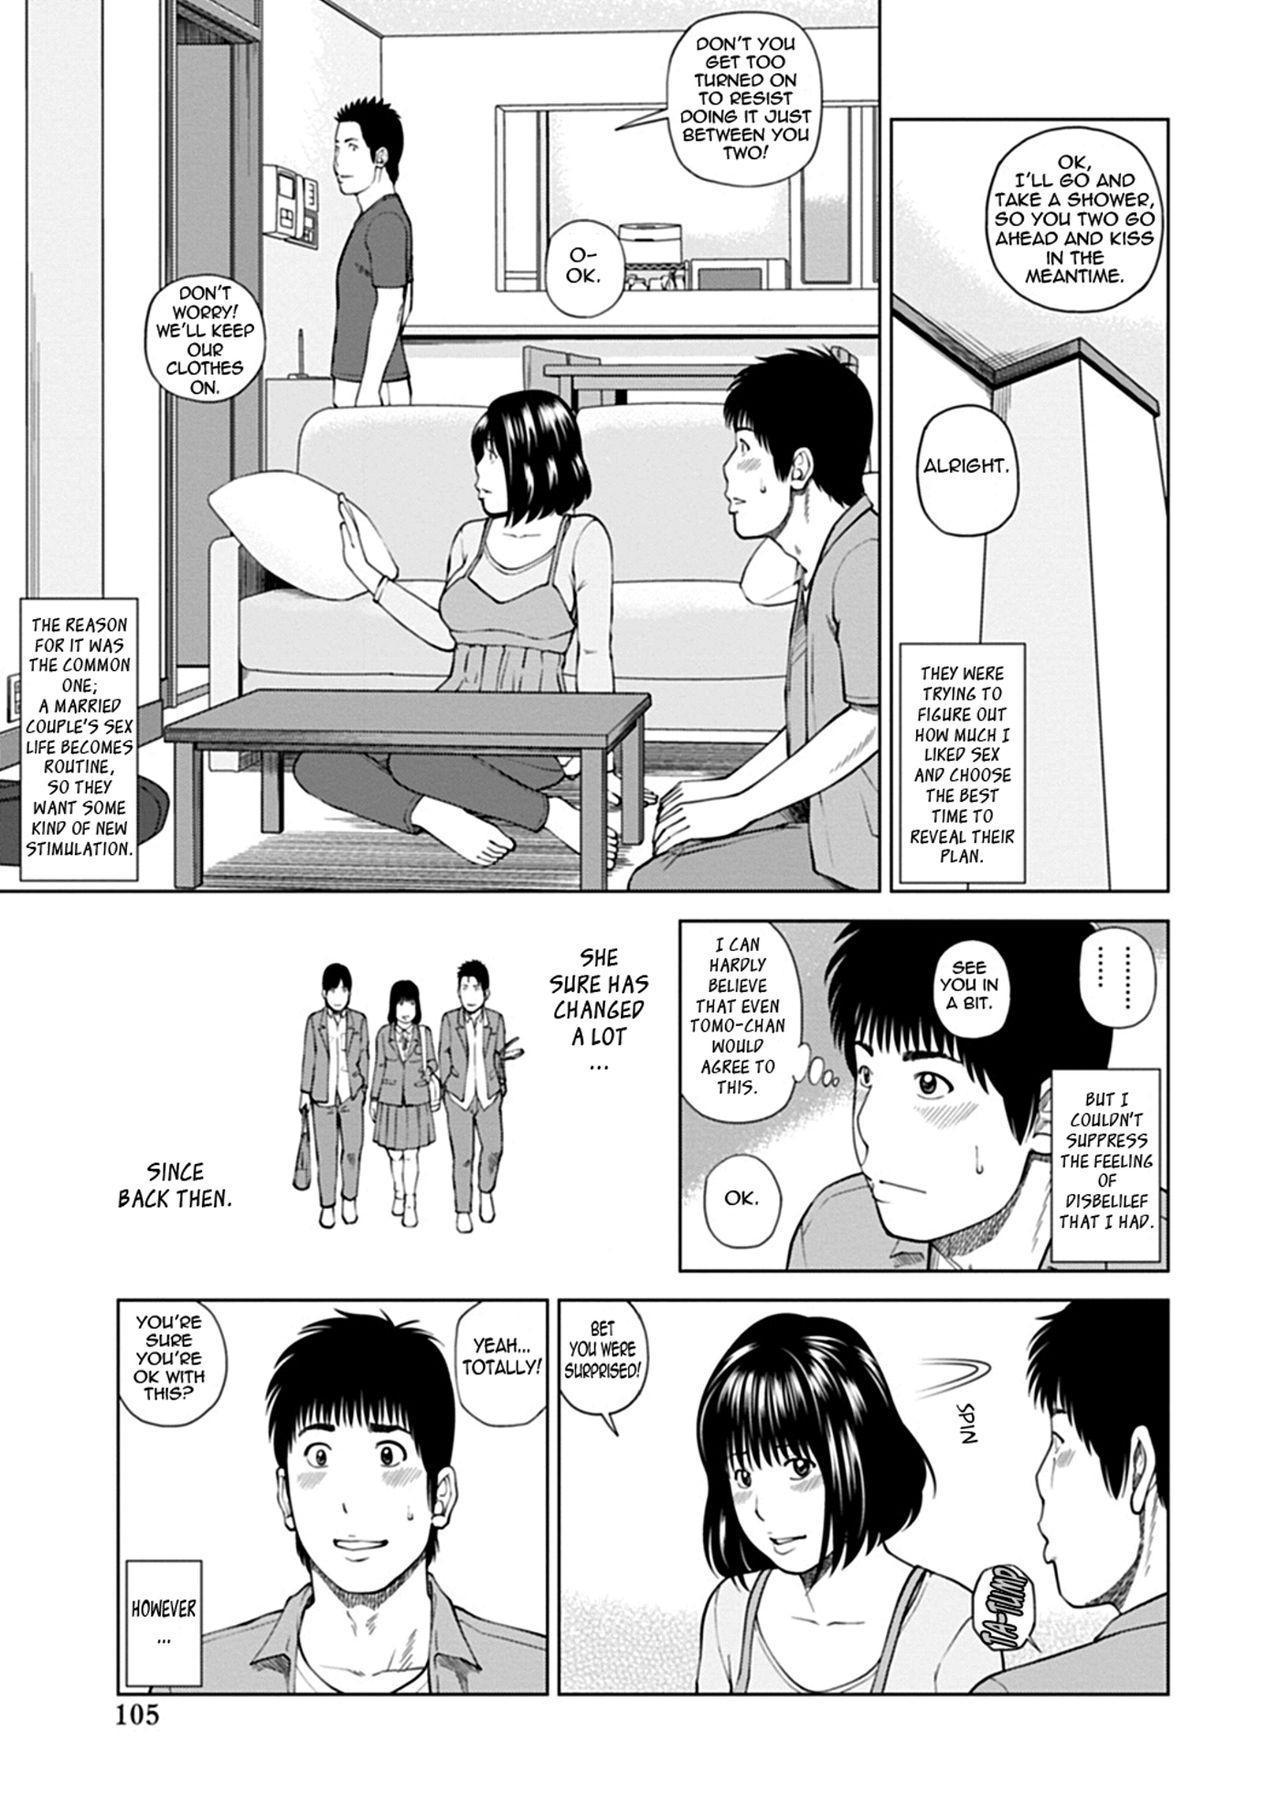 [Kuroki Hidehiko] 36-sai Injuku Sakarizuma | 36-Year-Old Randy Mature Wife [English] {Tadanohito} [Digital] [Uncensored] 100